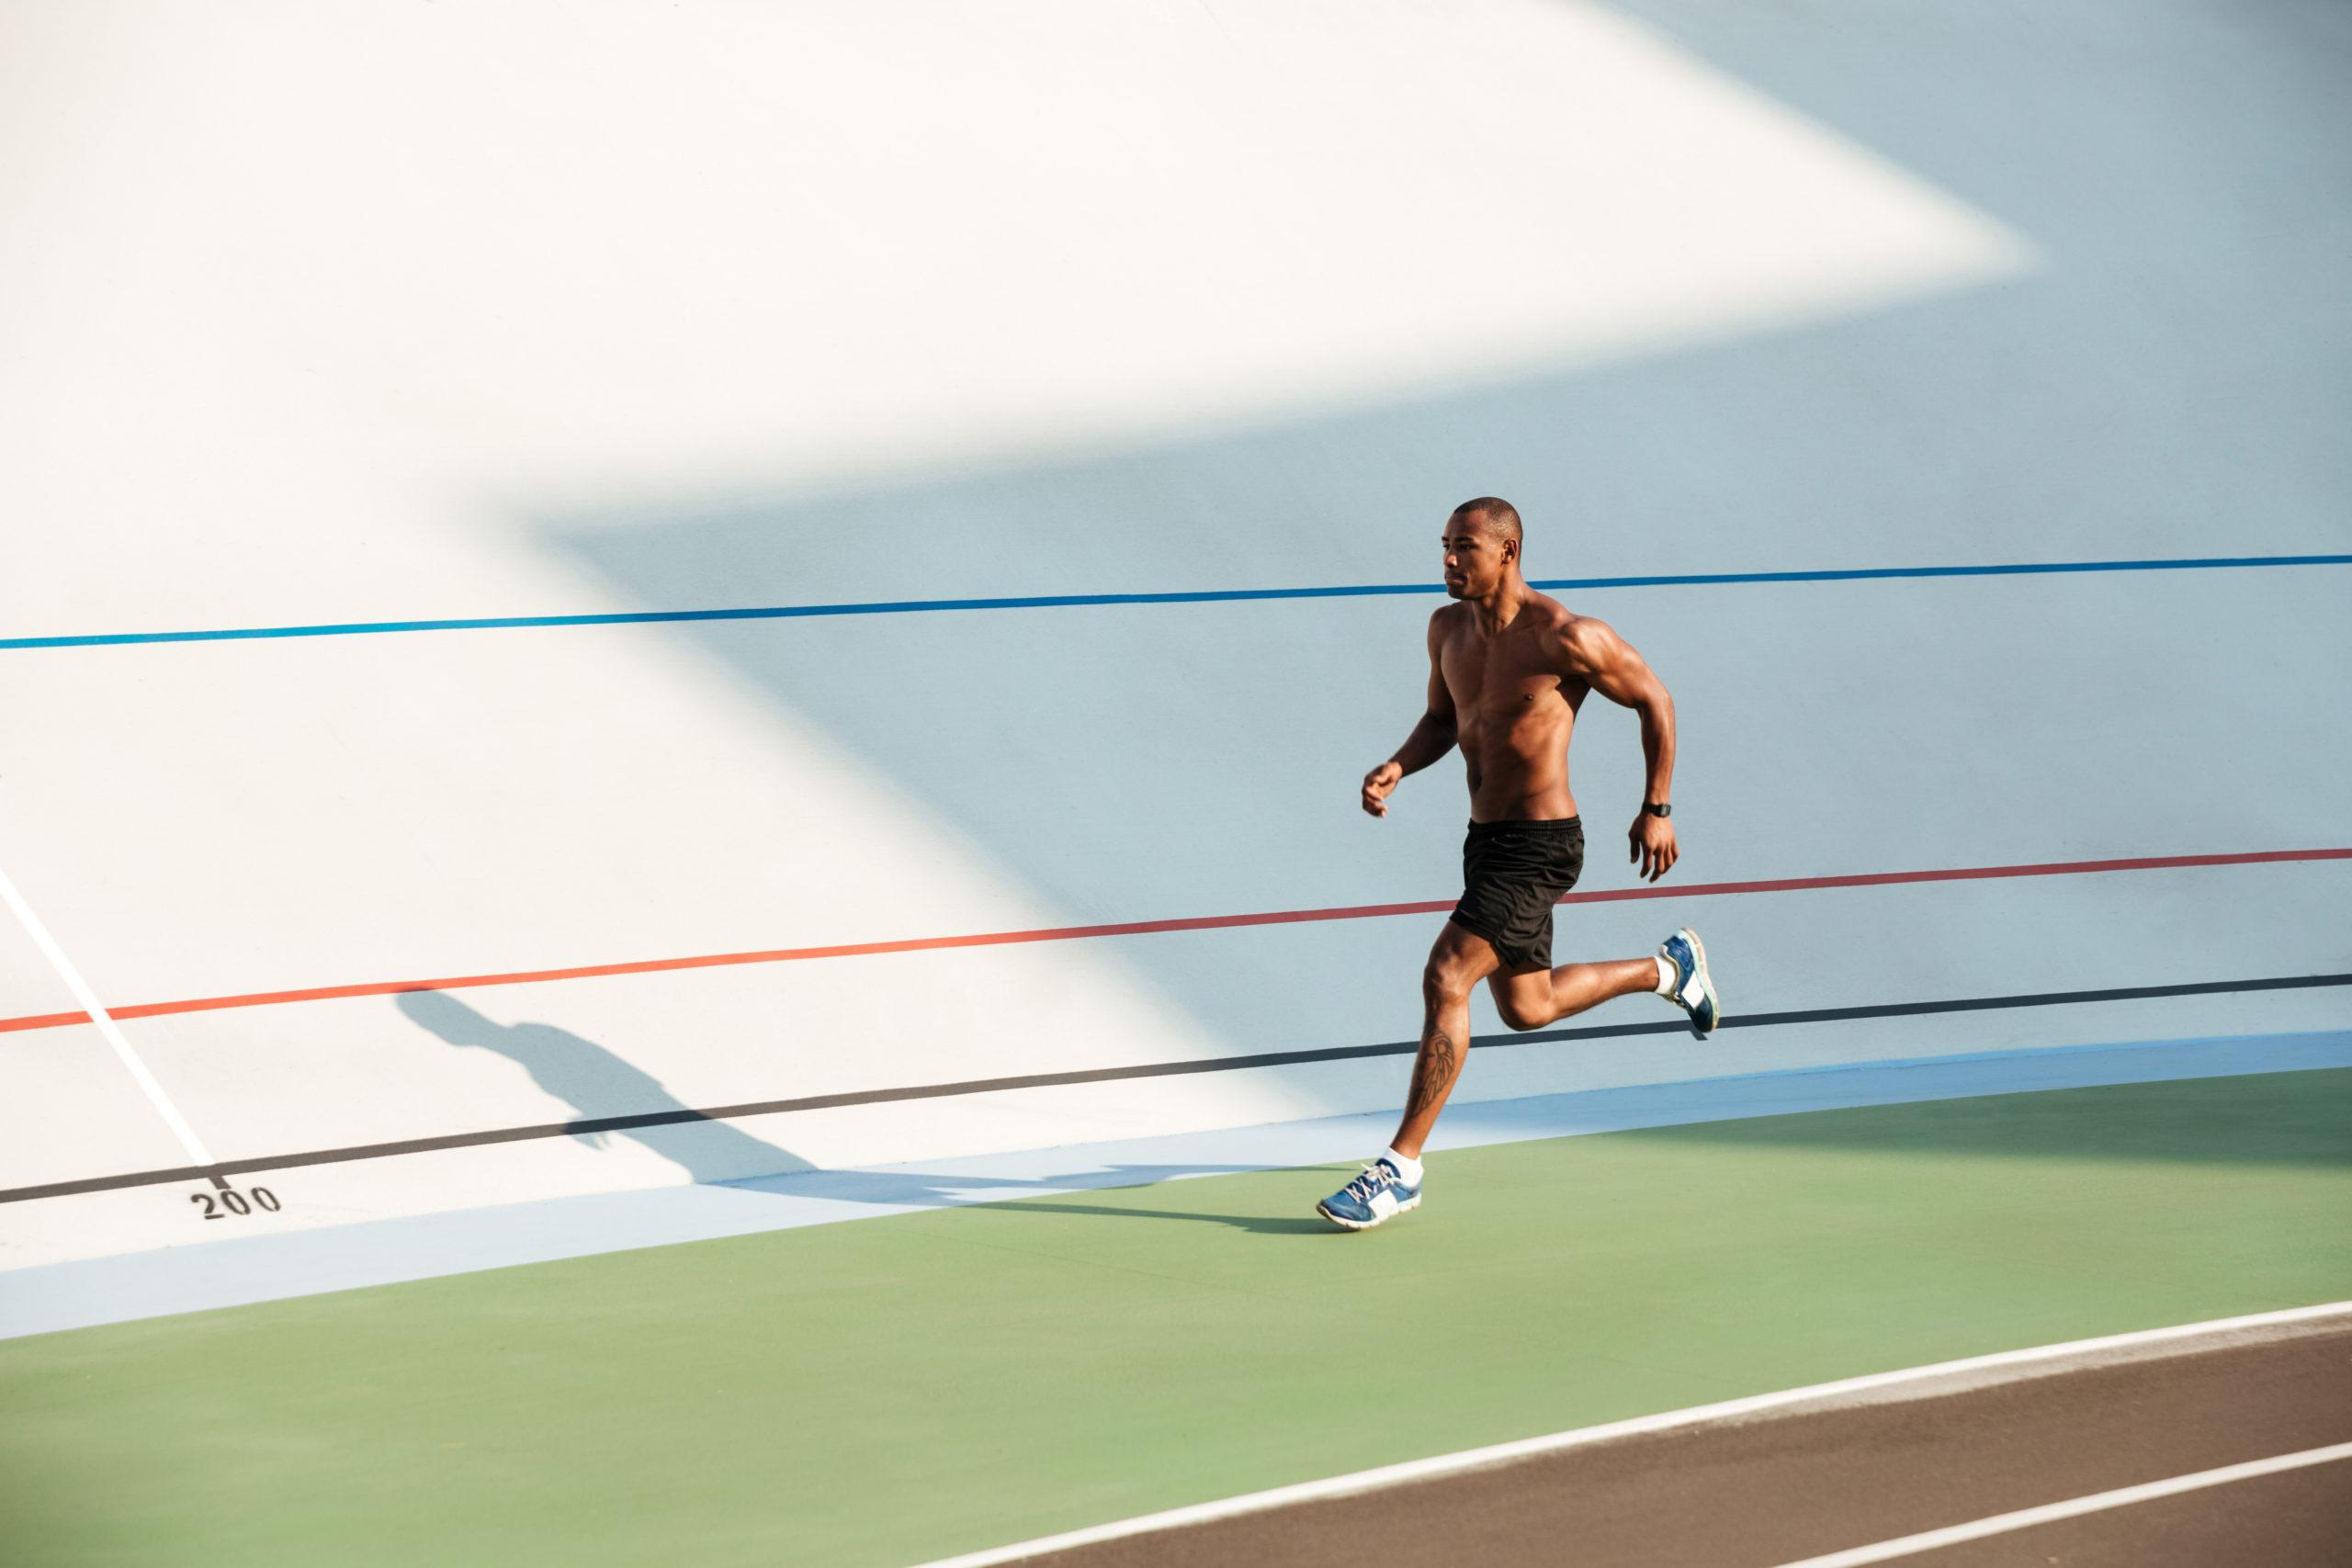 sportif-course-sprint-seance-explosivite